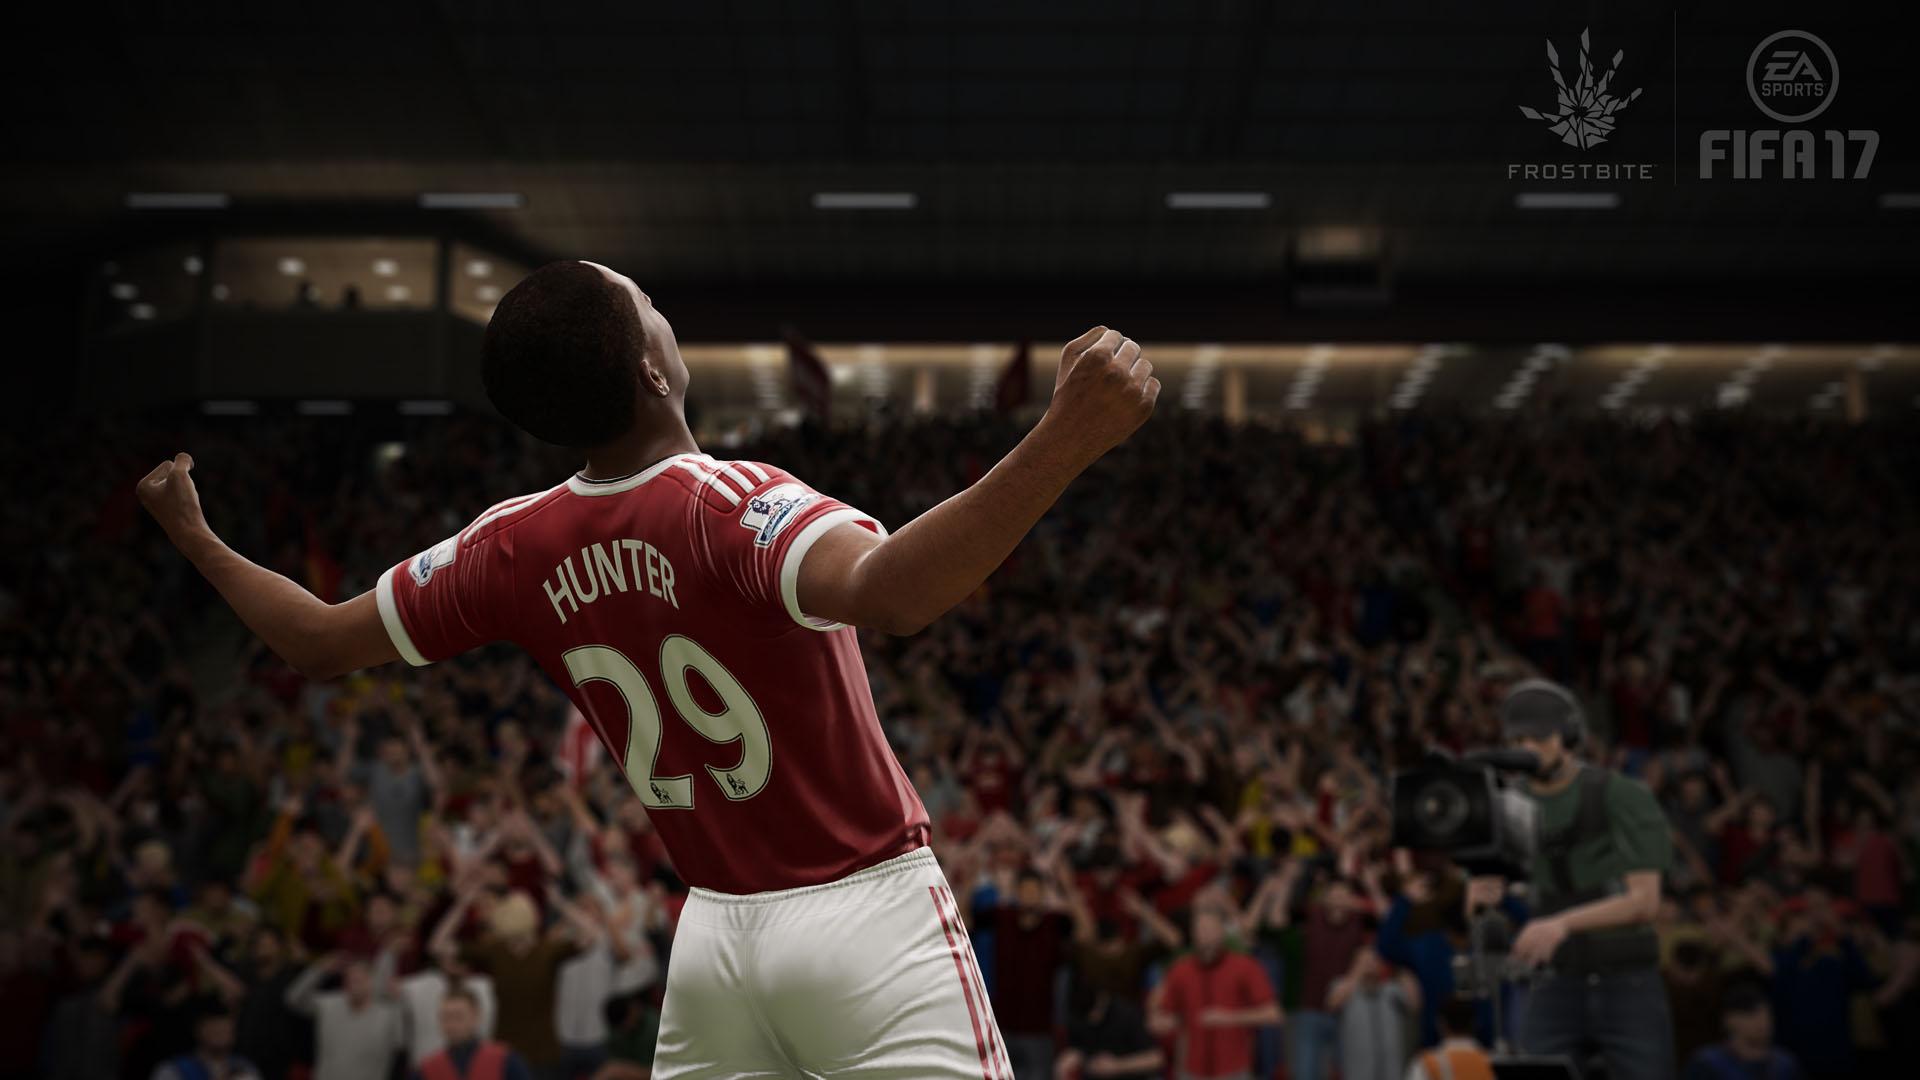 ea-sports-fifa-17-vgprofessional-review-7